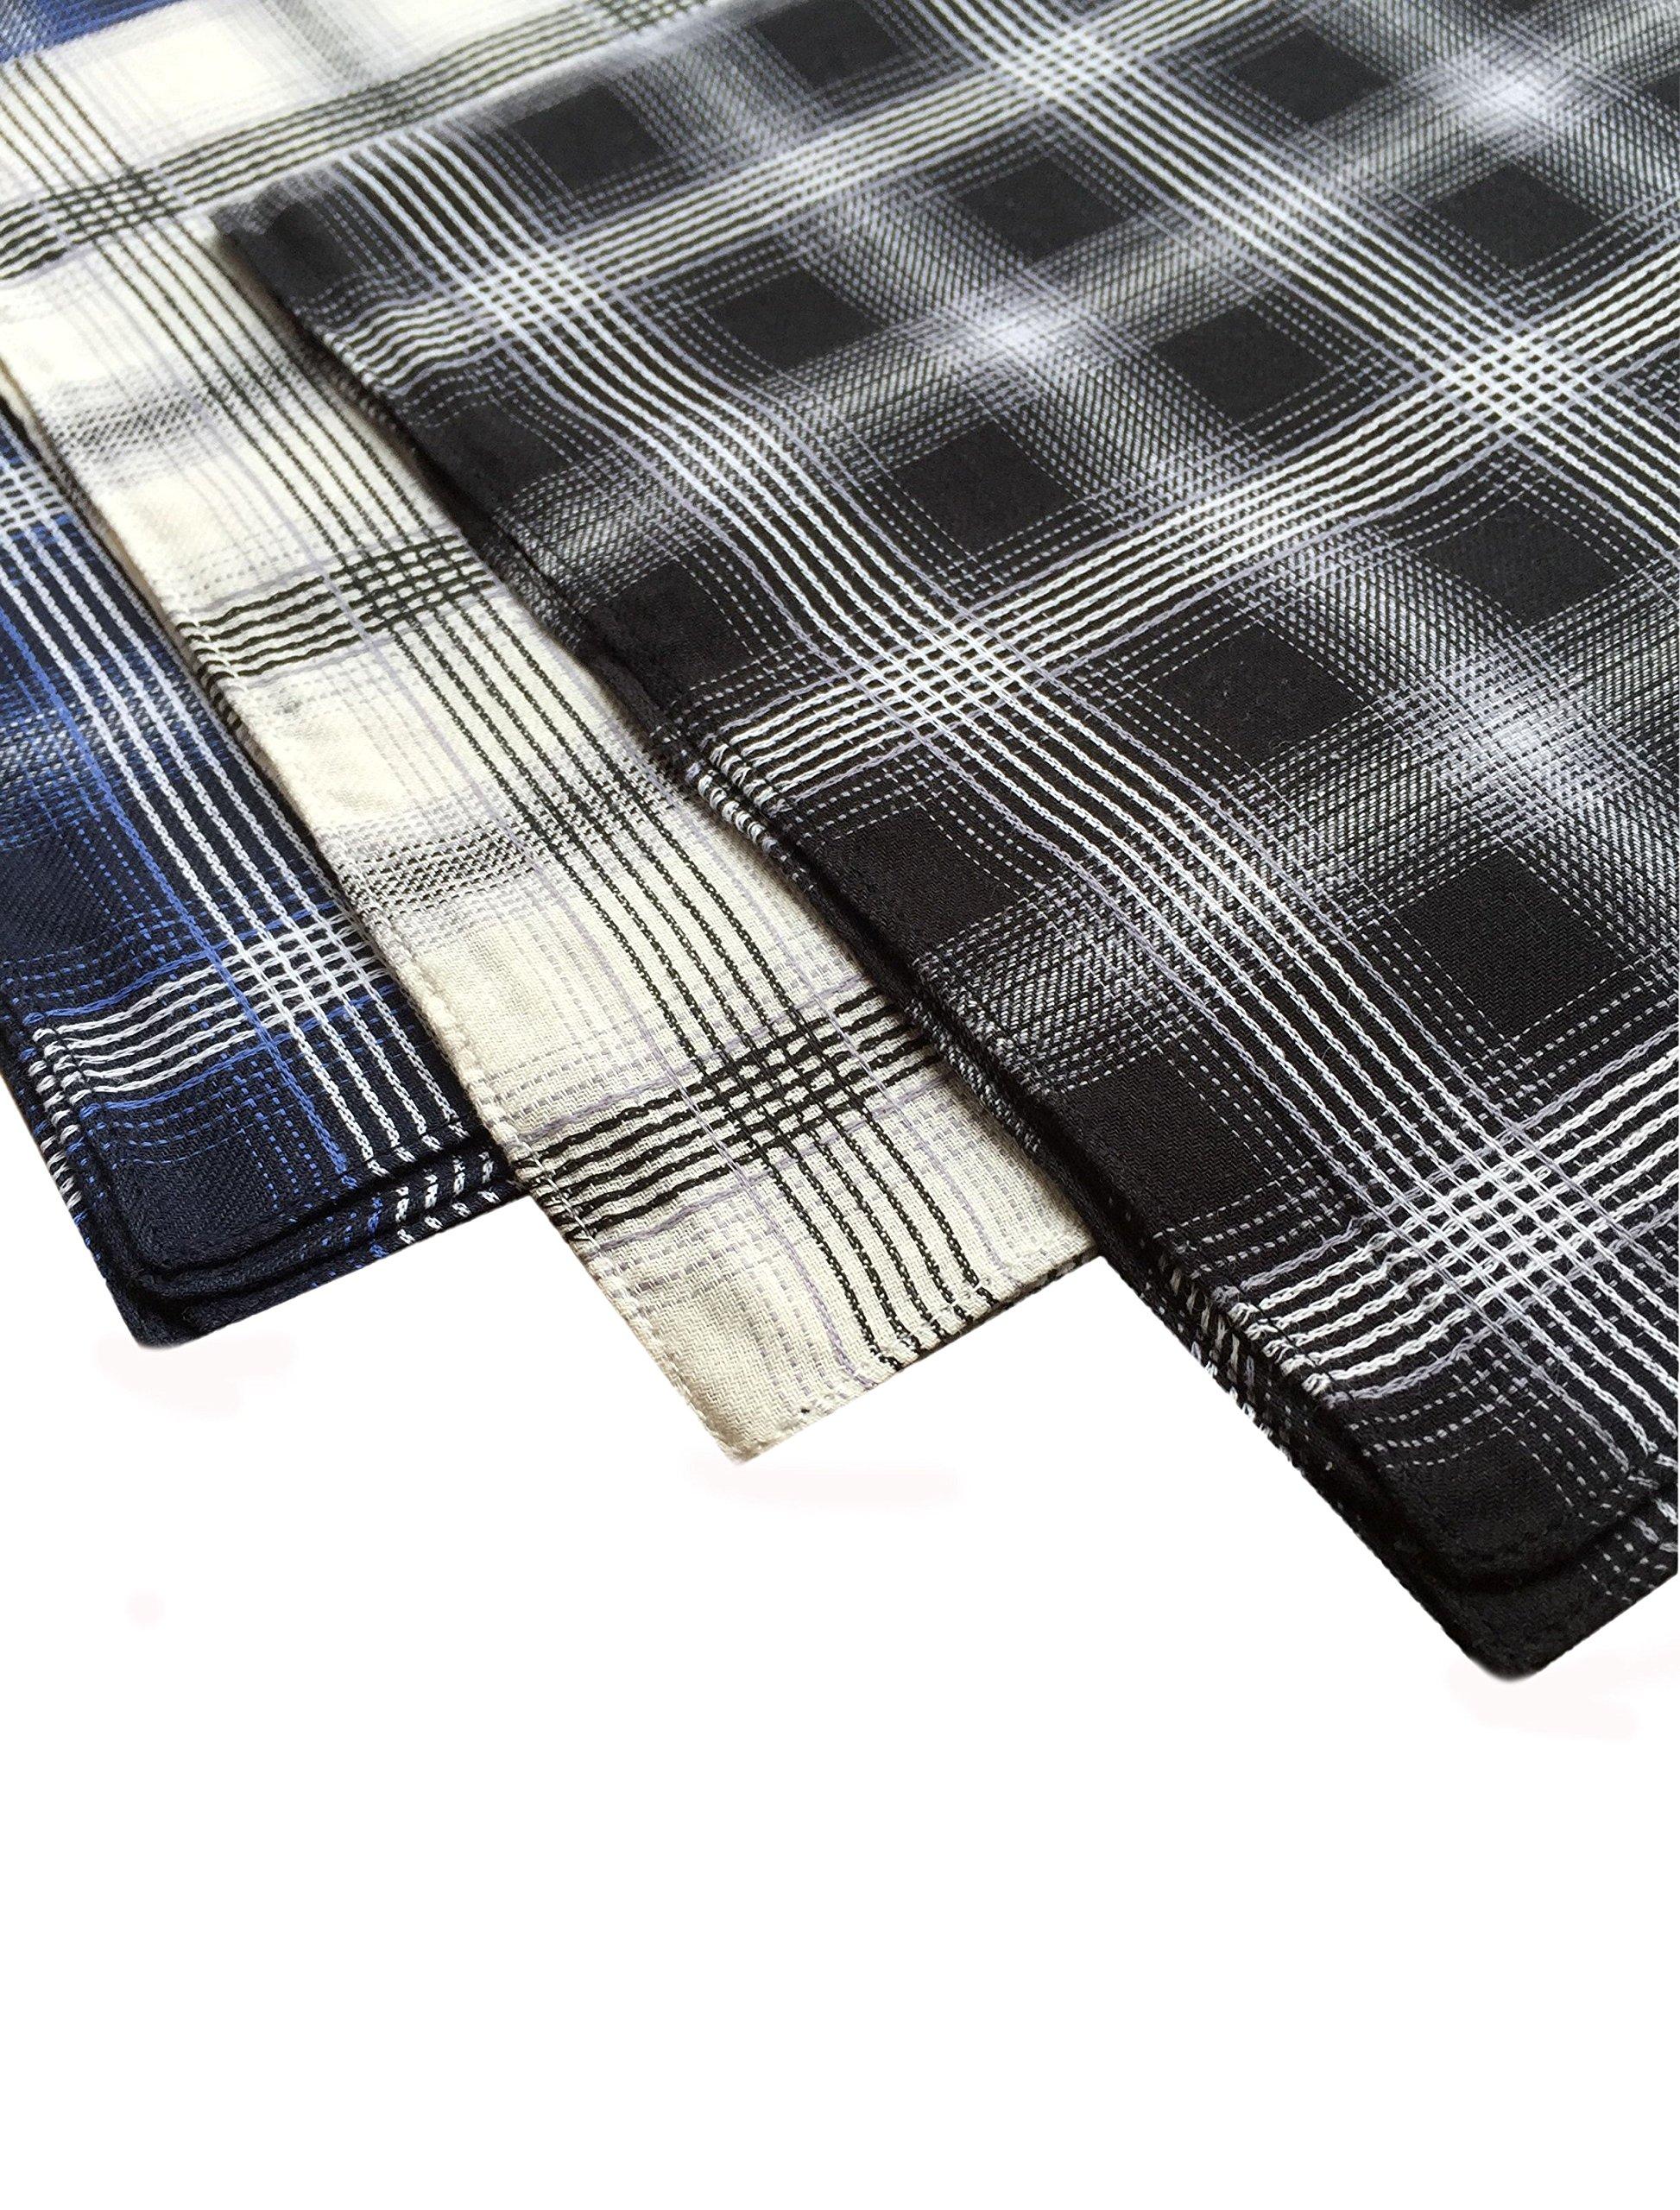 KINGDESON Men's Elegent Checkered Cotton Hankie Hankerchiefs gift set 3PCS by KINGDESON (Image #3)